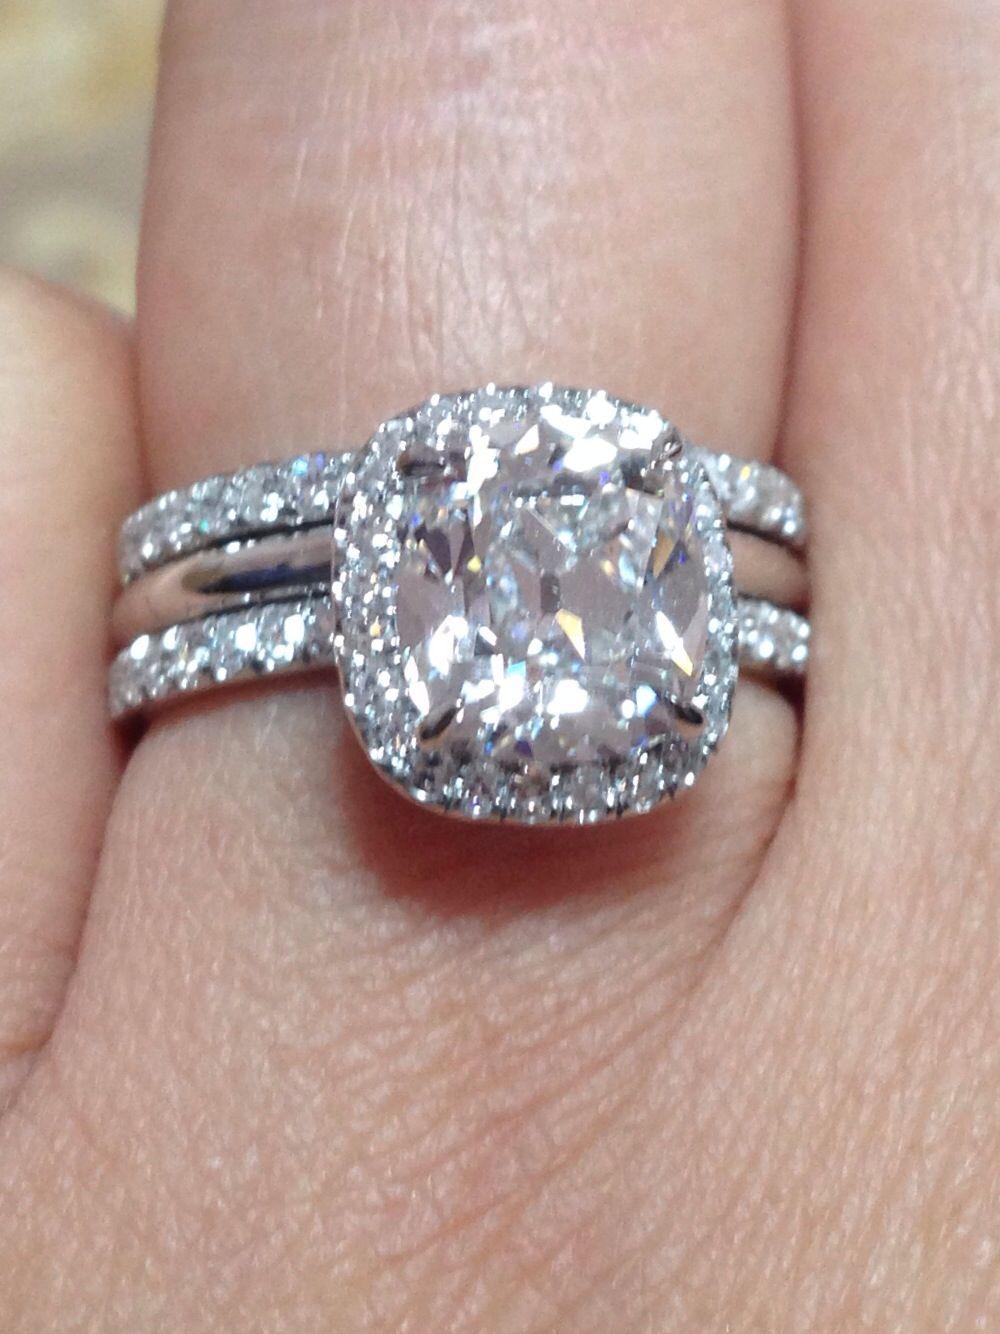 Victor Canera Custom Platinum Spacer Pave Eternity Wedding Band And Emilya Engagement Ring Wedding Rings Rings Eternity Wedding Band